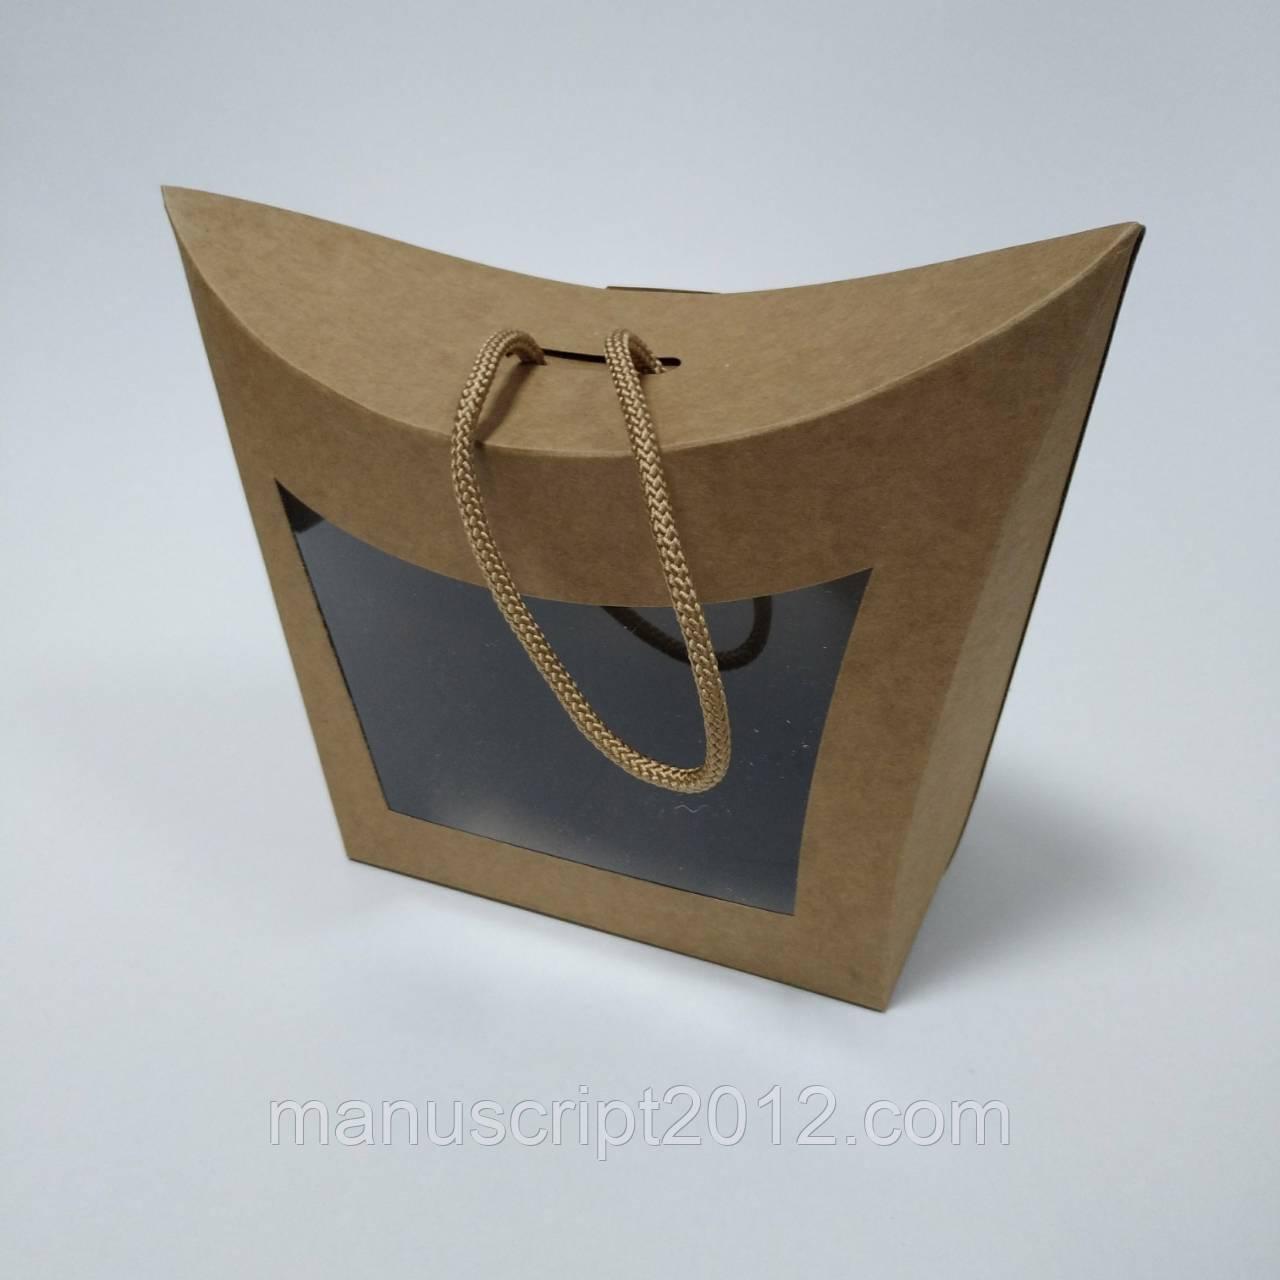 Коробка подарочная с окном и ручкой (крафт) 155х80х140 мм.